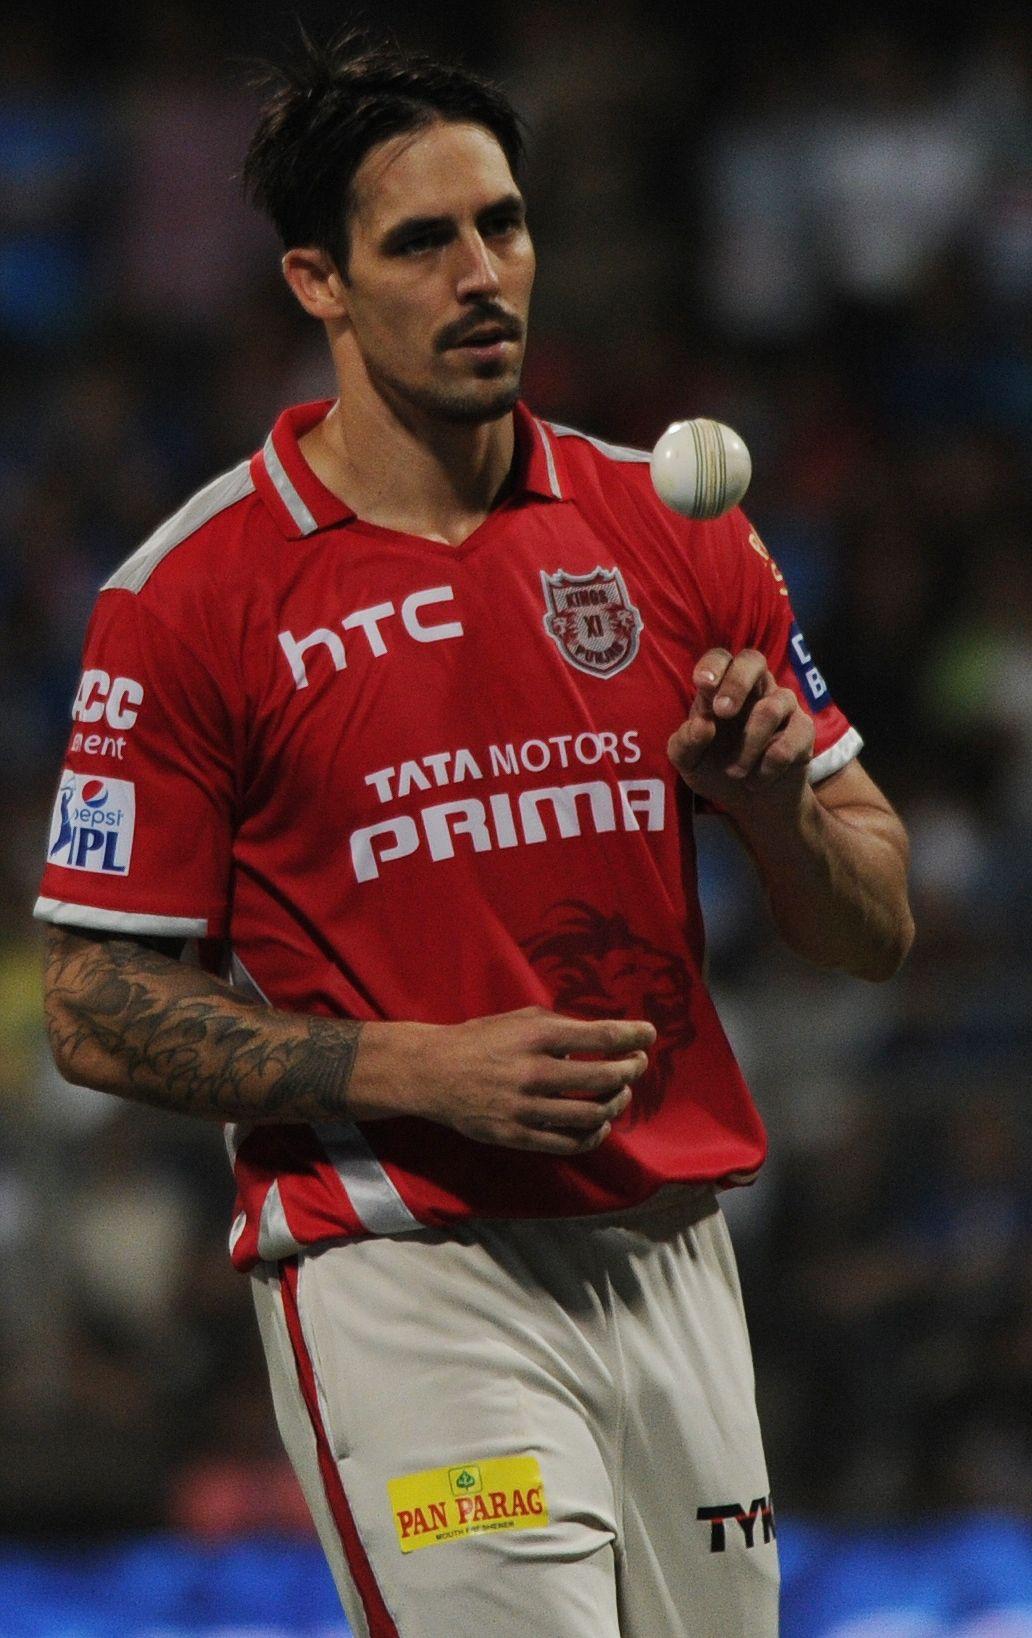 Mitchell Johnson IPL wallpaper IPL 2017 Indian Premier